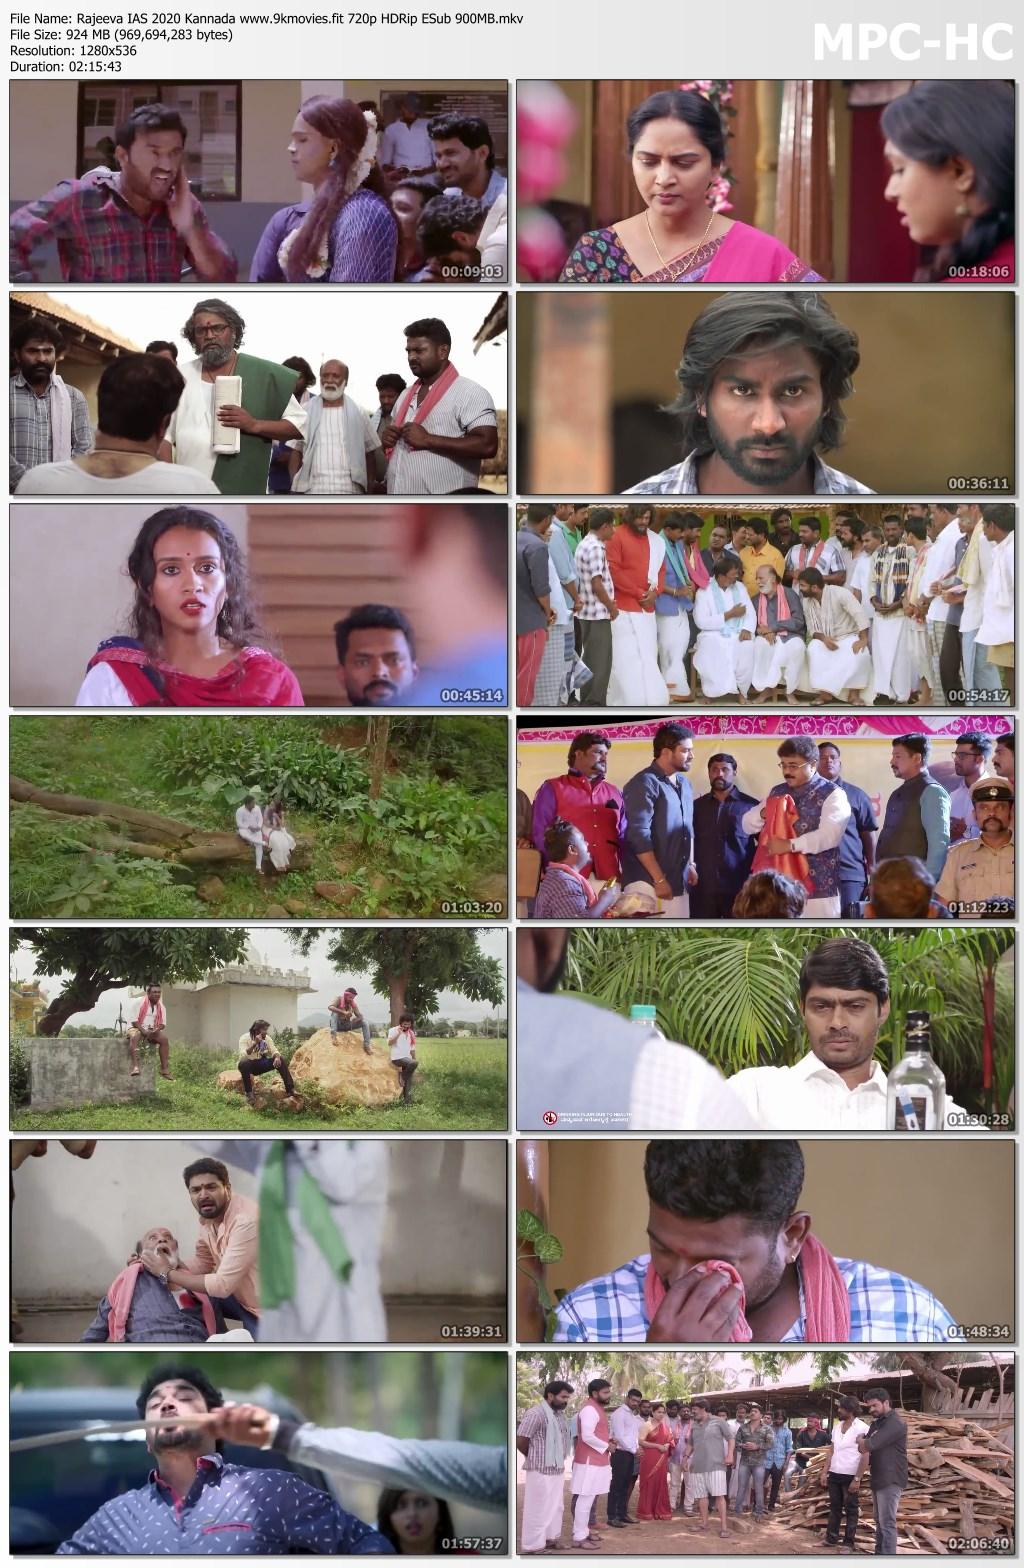 Rajeeva IAS 2020 Kannada 720p HDRip ESub 922MB Download